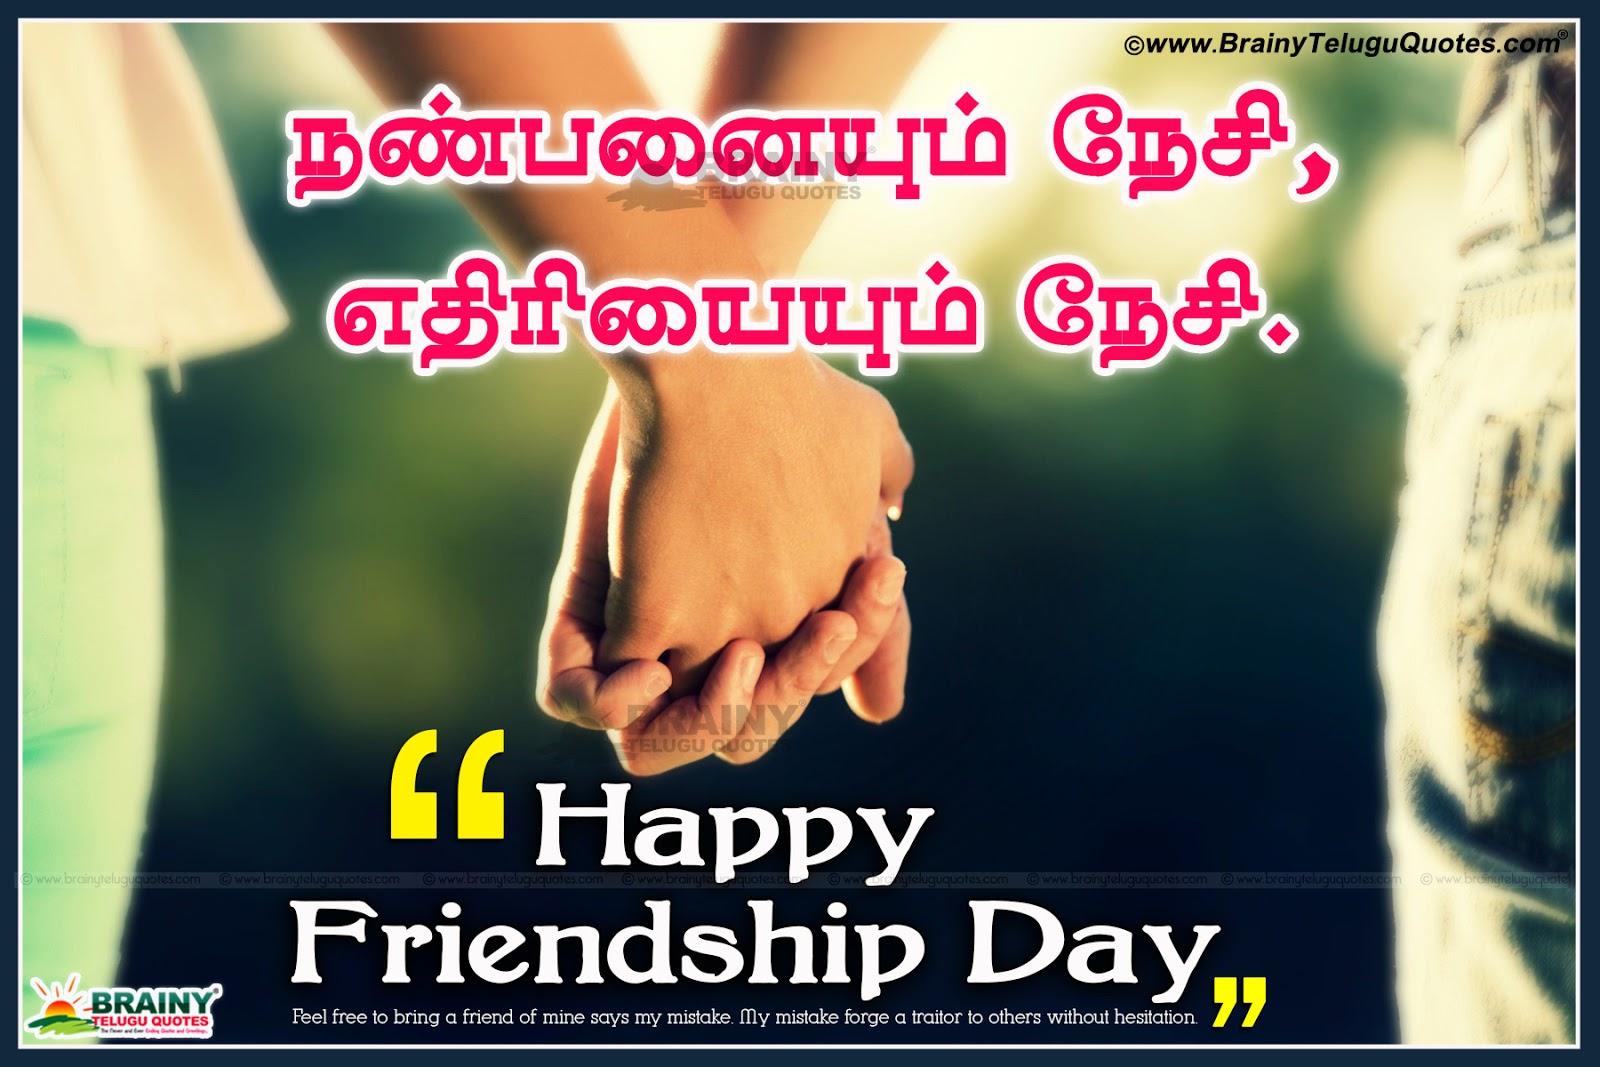 Top 10 Punto Medio Noticias | Best Friendship Songs In Tamil Movies